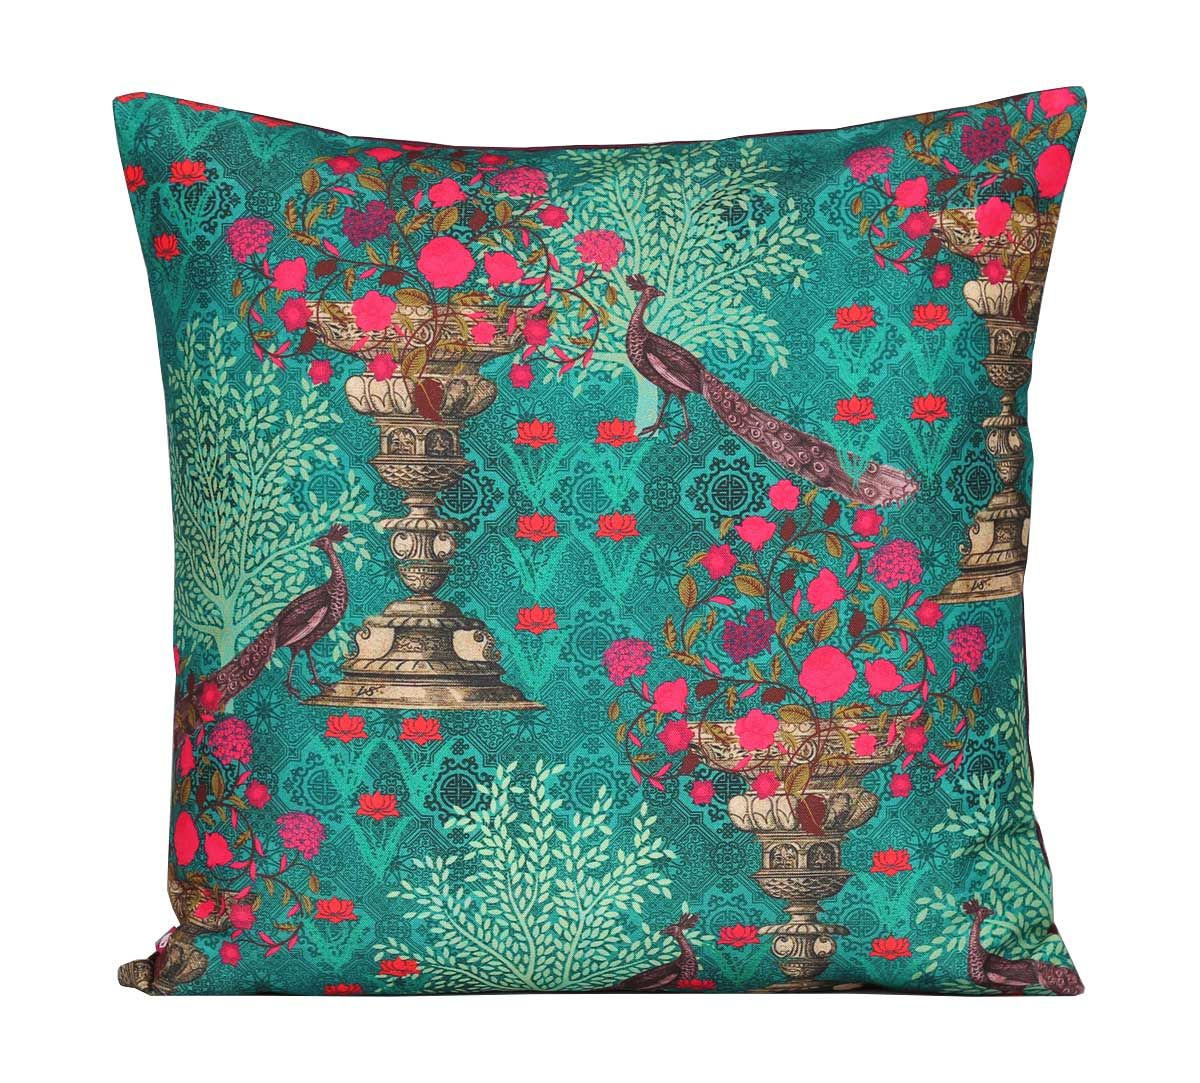 India Circus Sea Green Floral Pillar Crest Canvas Cushion Cover